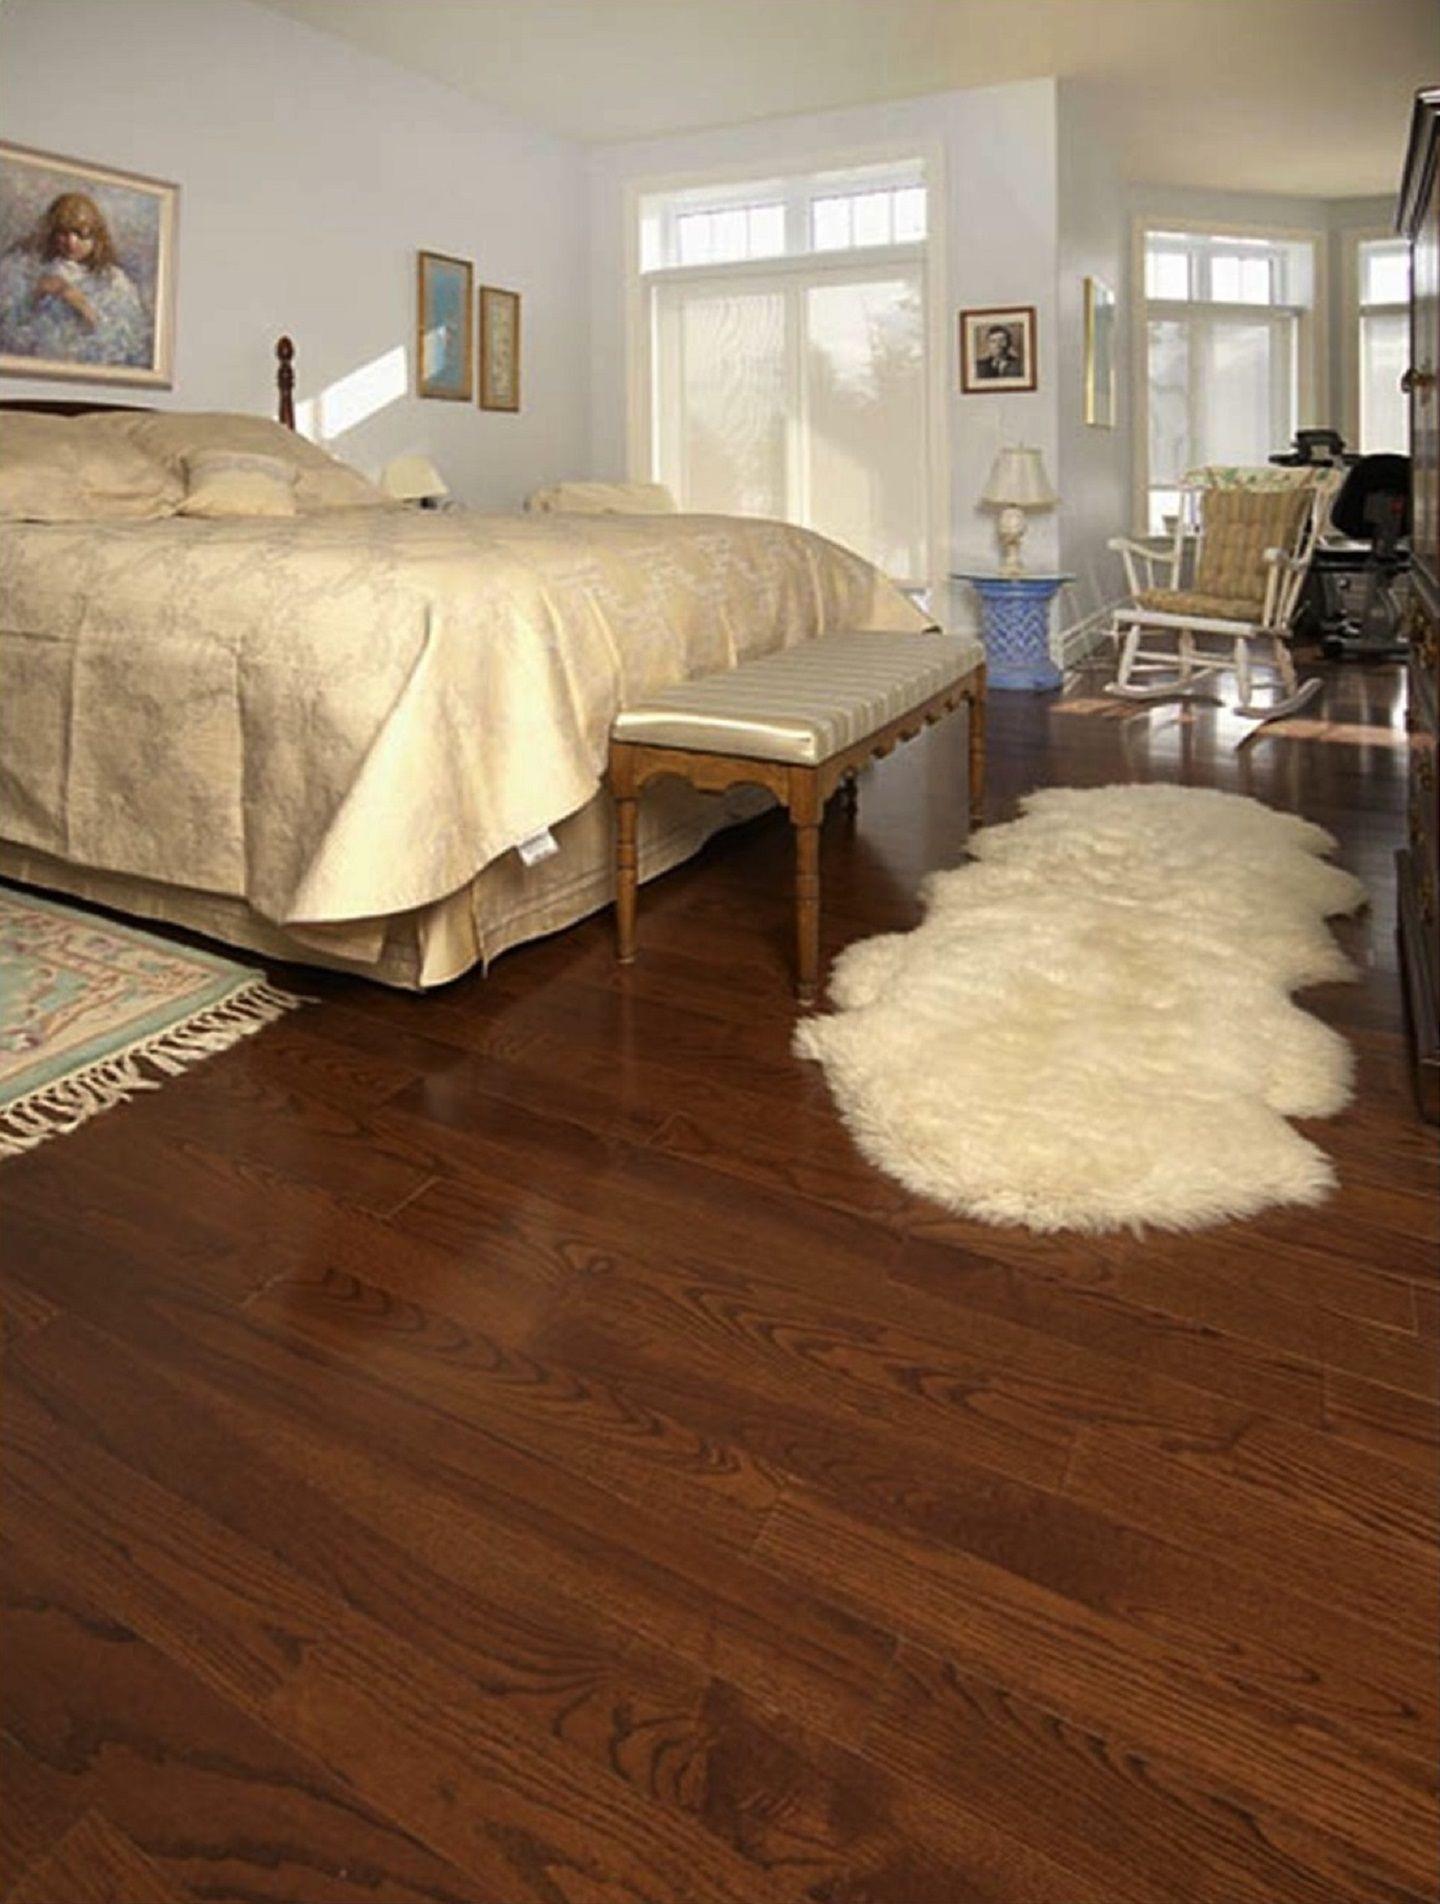 hardwood floors and more of ash brandon gaylord hardwood flooring hardwood floors pinterest with regard to ash brandon gaylord hardwood flooring